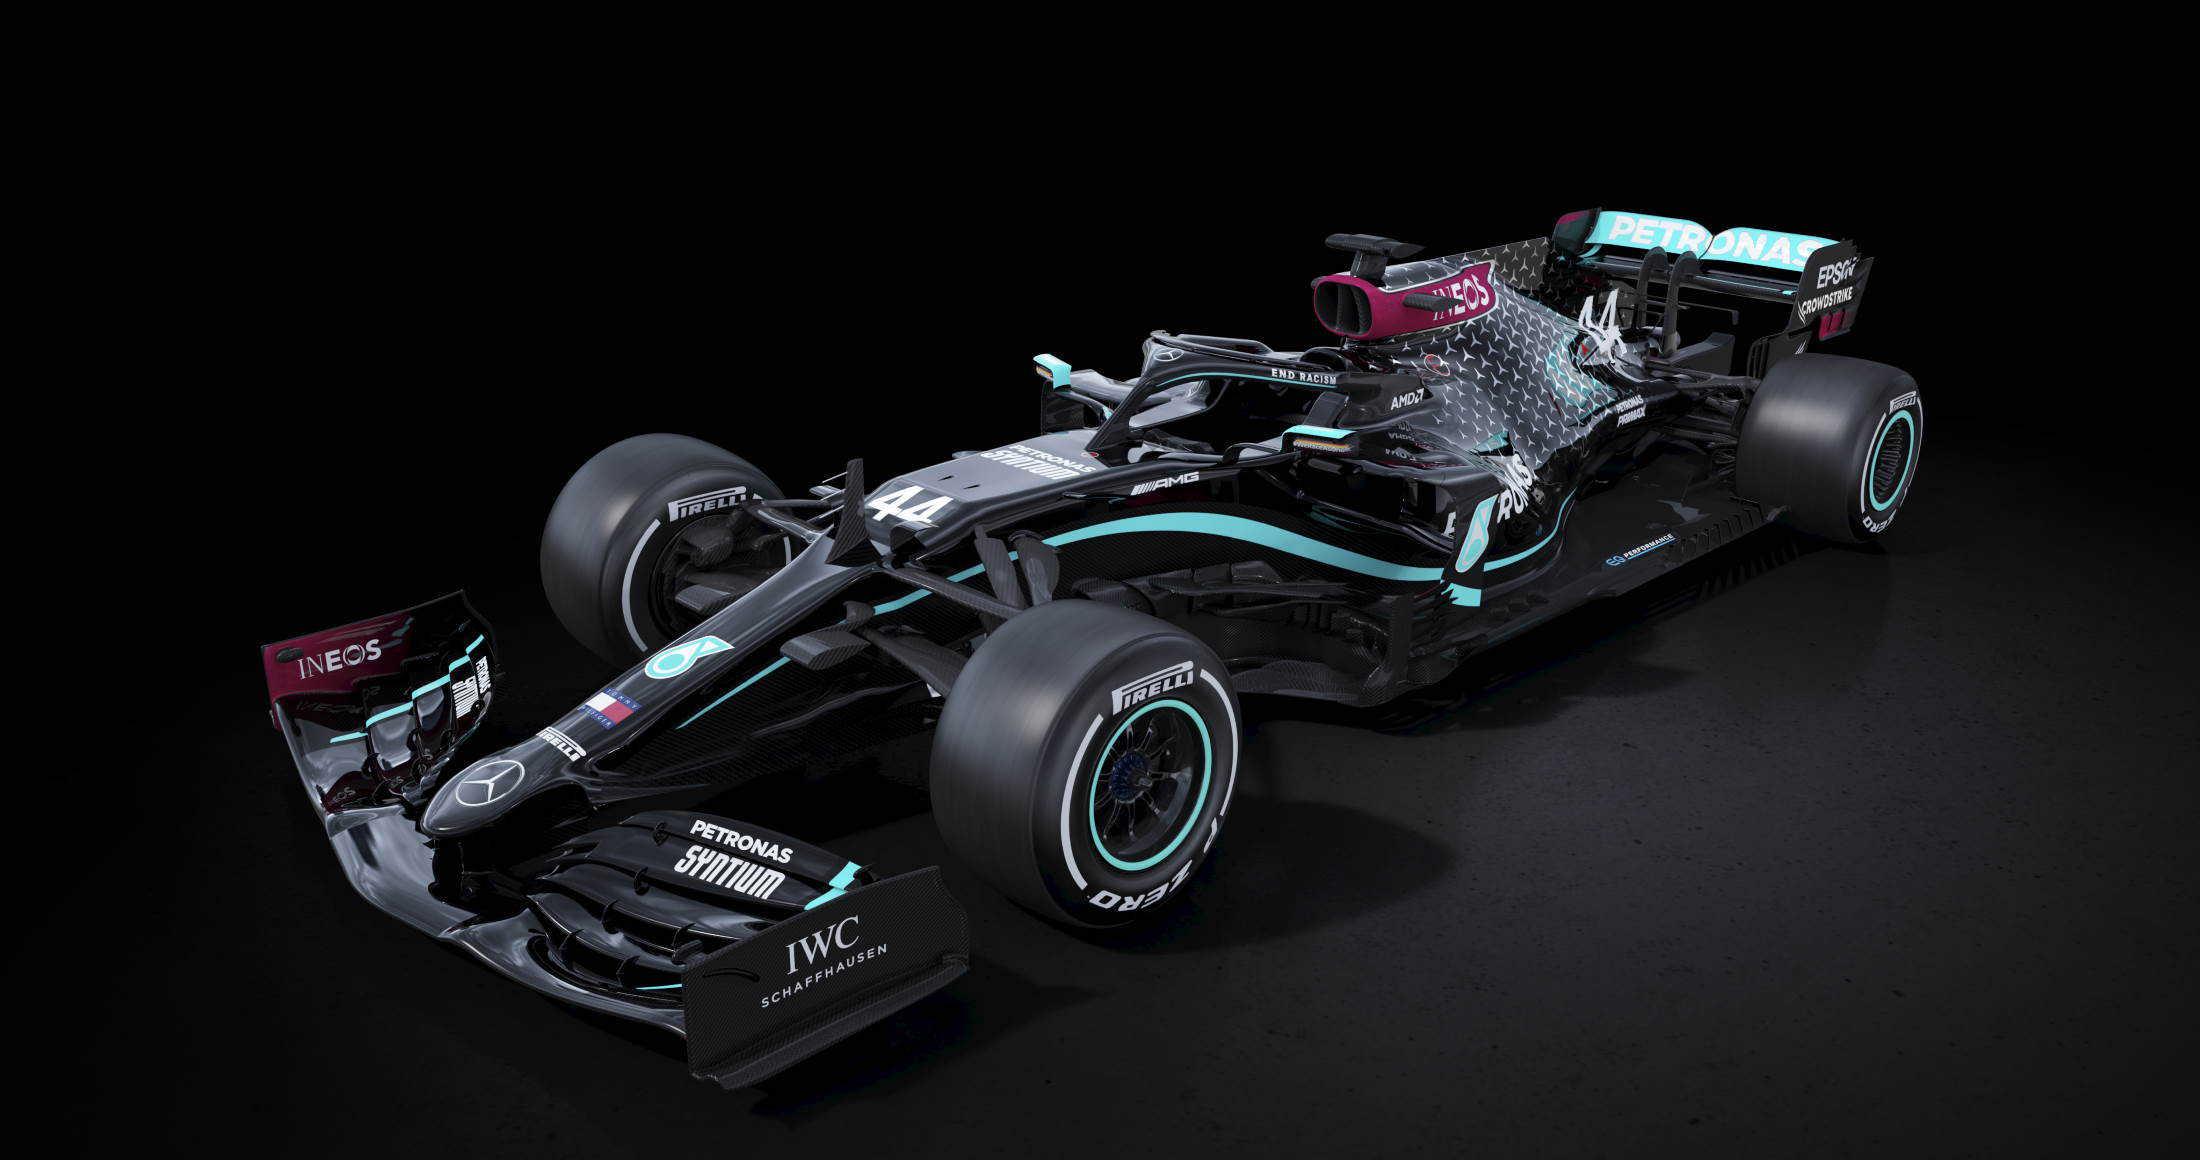 Mercedes F1 W11 black edition F1 2020 Photo Daimler